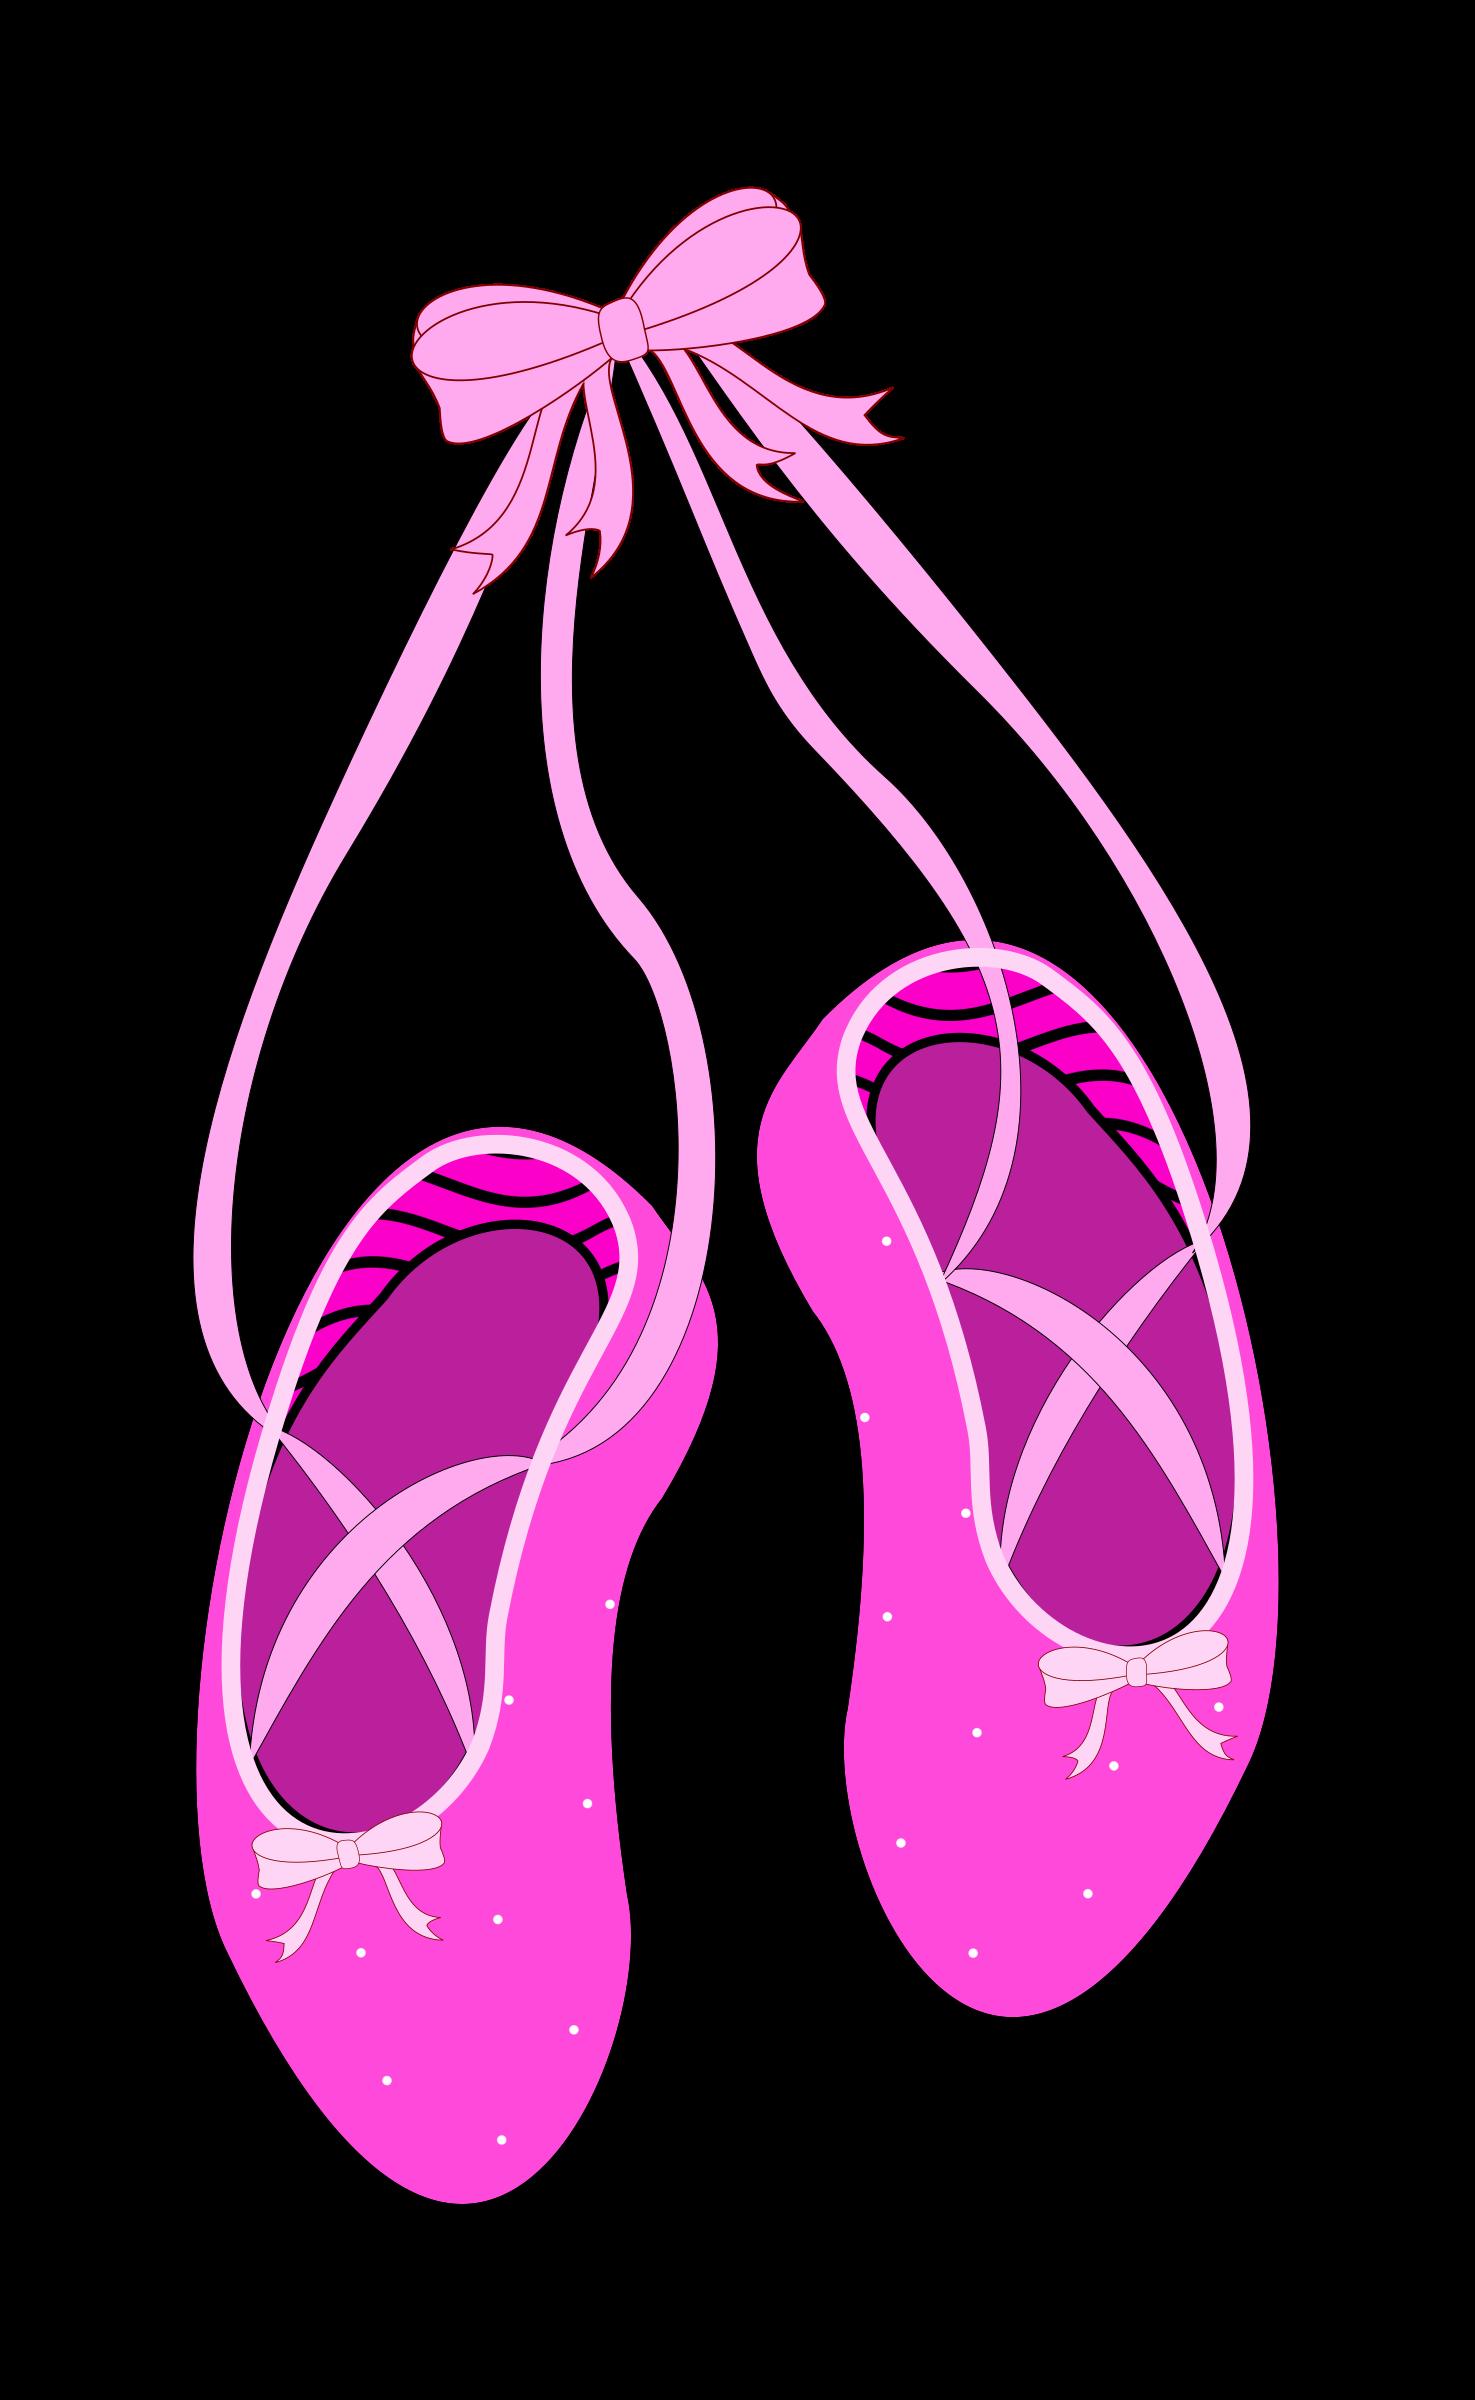 Ballerina clipart ballet slipper. Slippers big image png